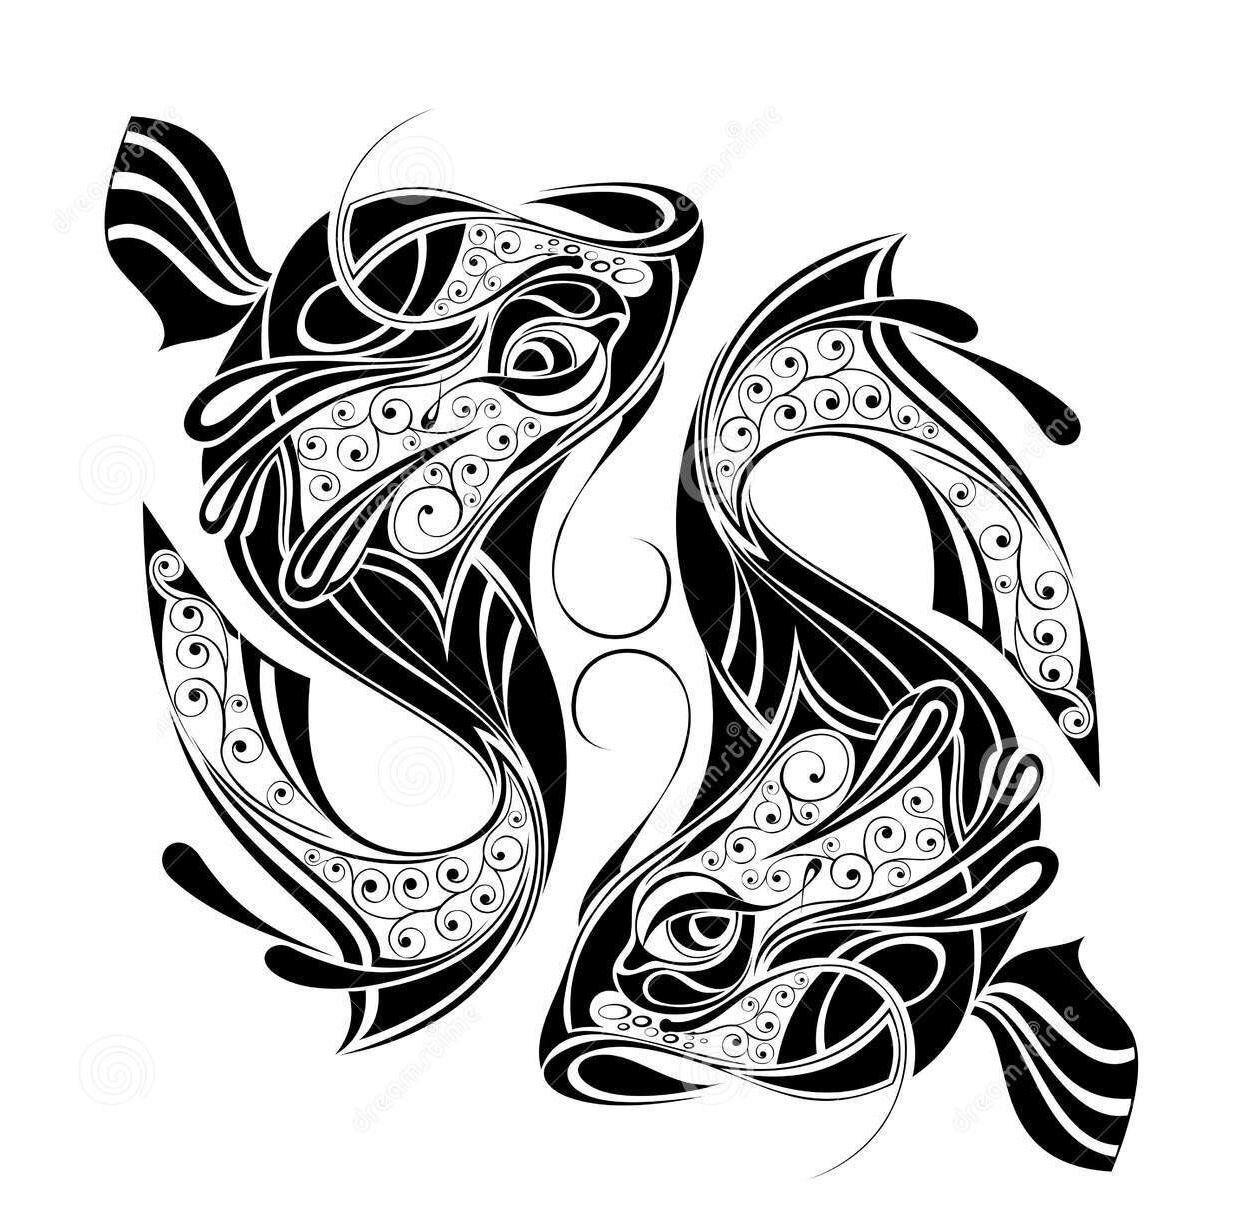 Sign tattoo designs - Zodiac Wheel With Sign Of Pisces Tattoo Design By Kseniya Polishchuk Via Dreamstime